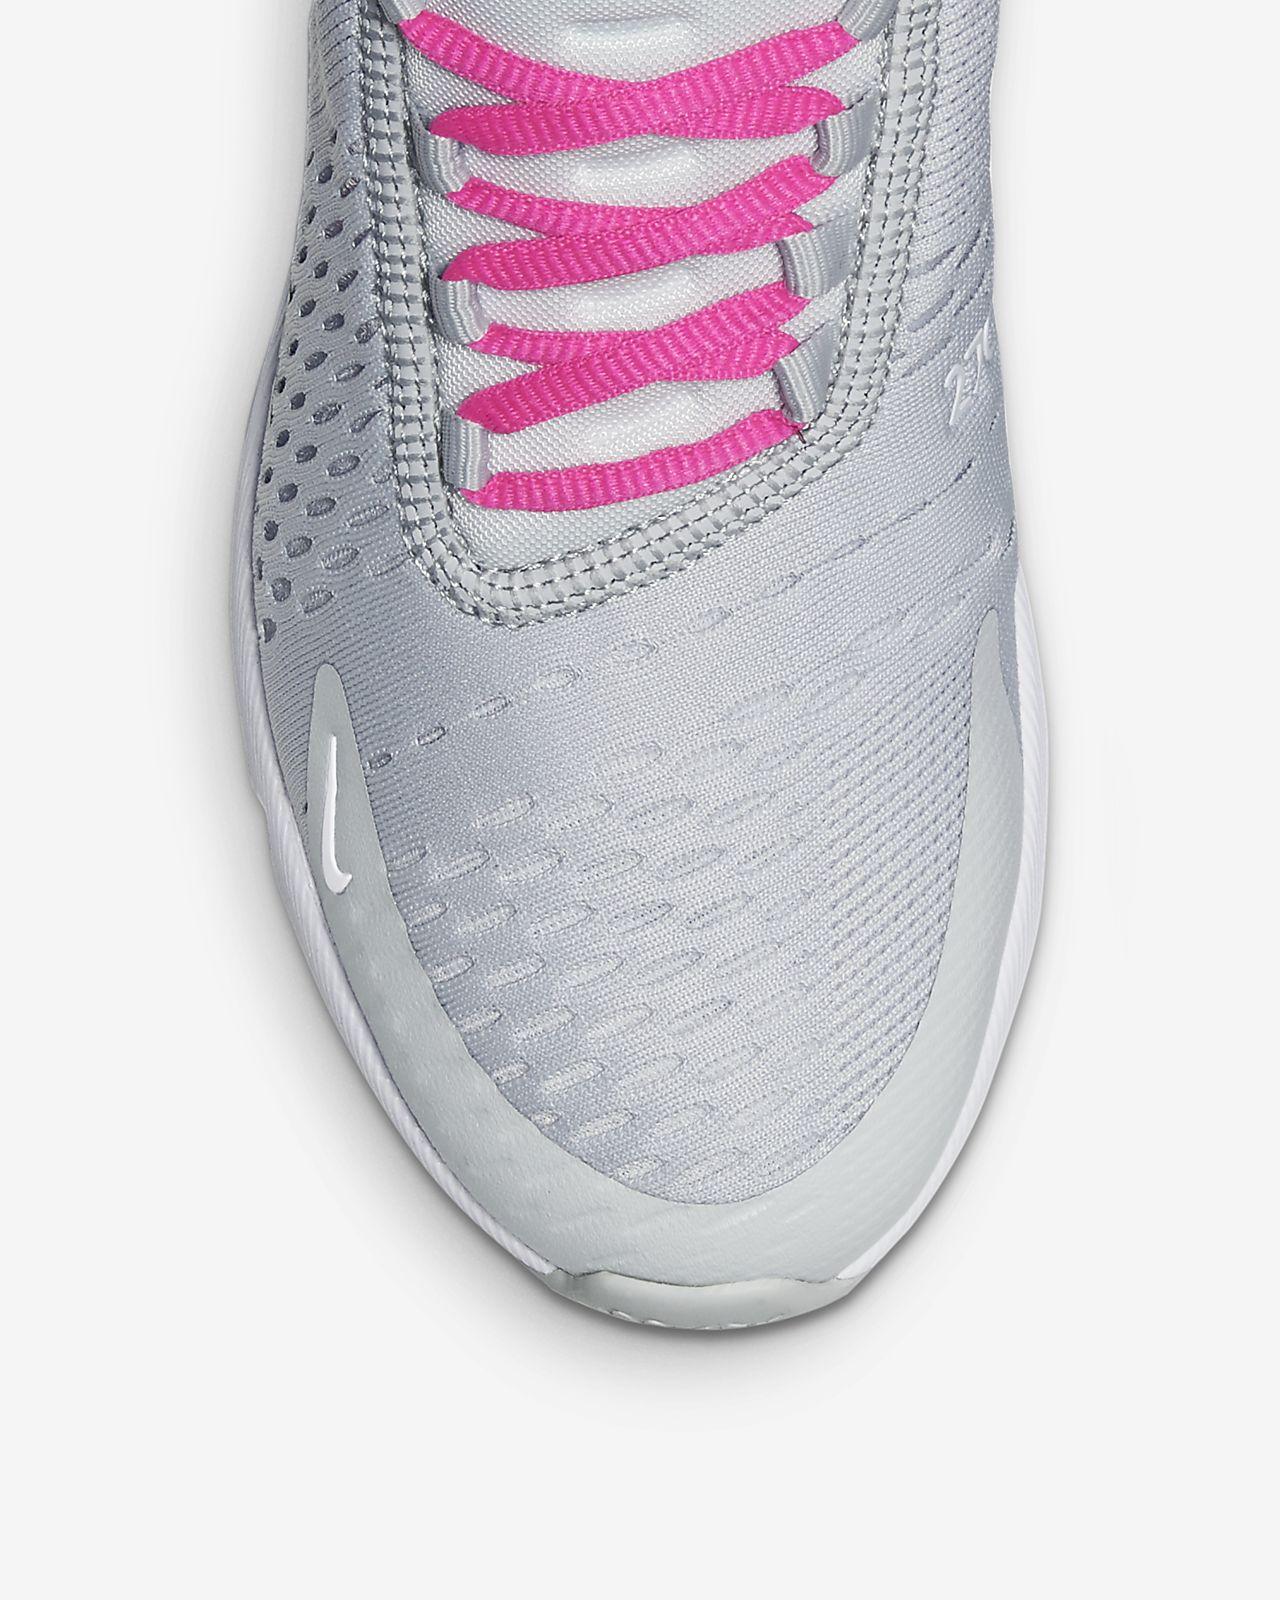 Nike Singles Day